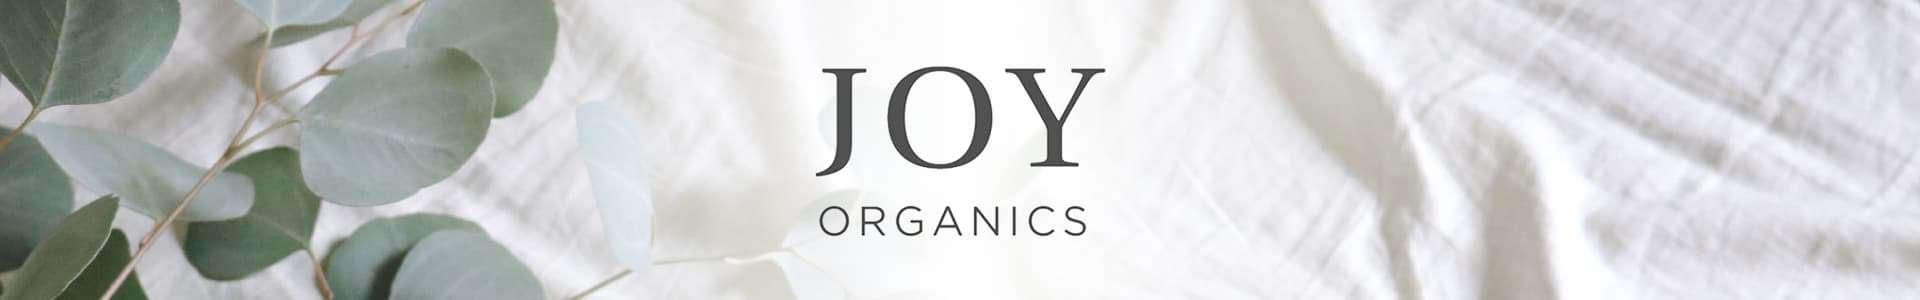 joy organics cbd USDA